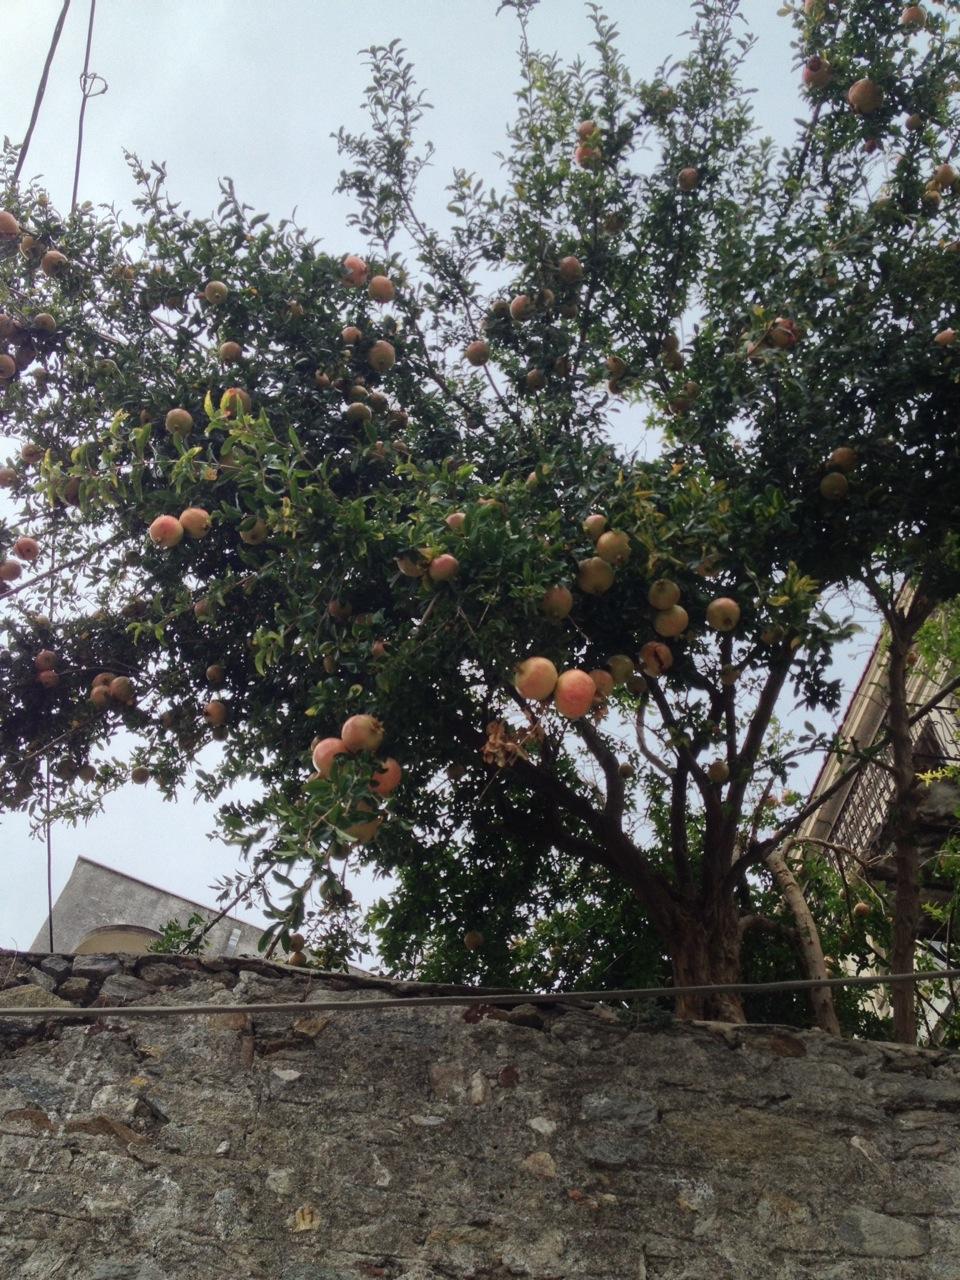 Pomegranates are everywhere